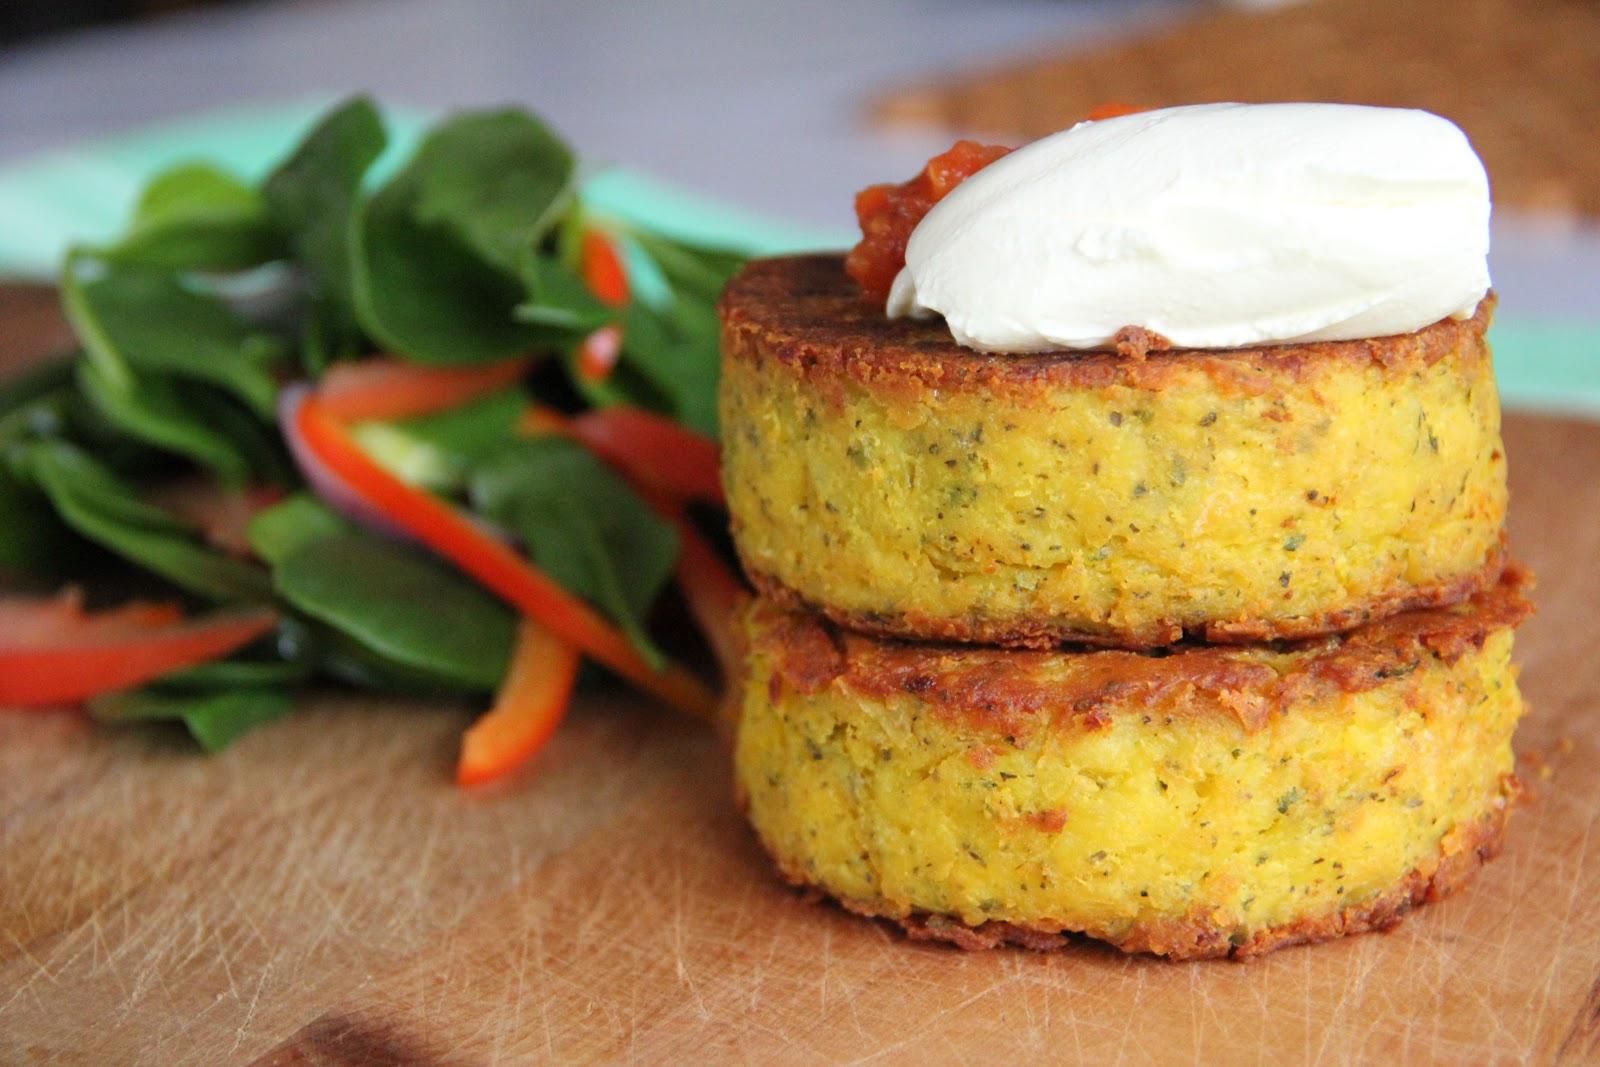 ... potato cakes potato caraway cakes crisp potato cakes mashed parmesan